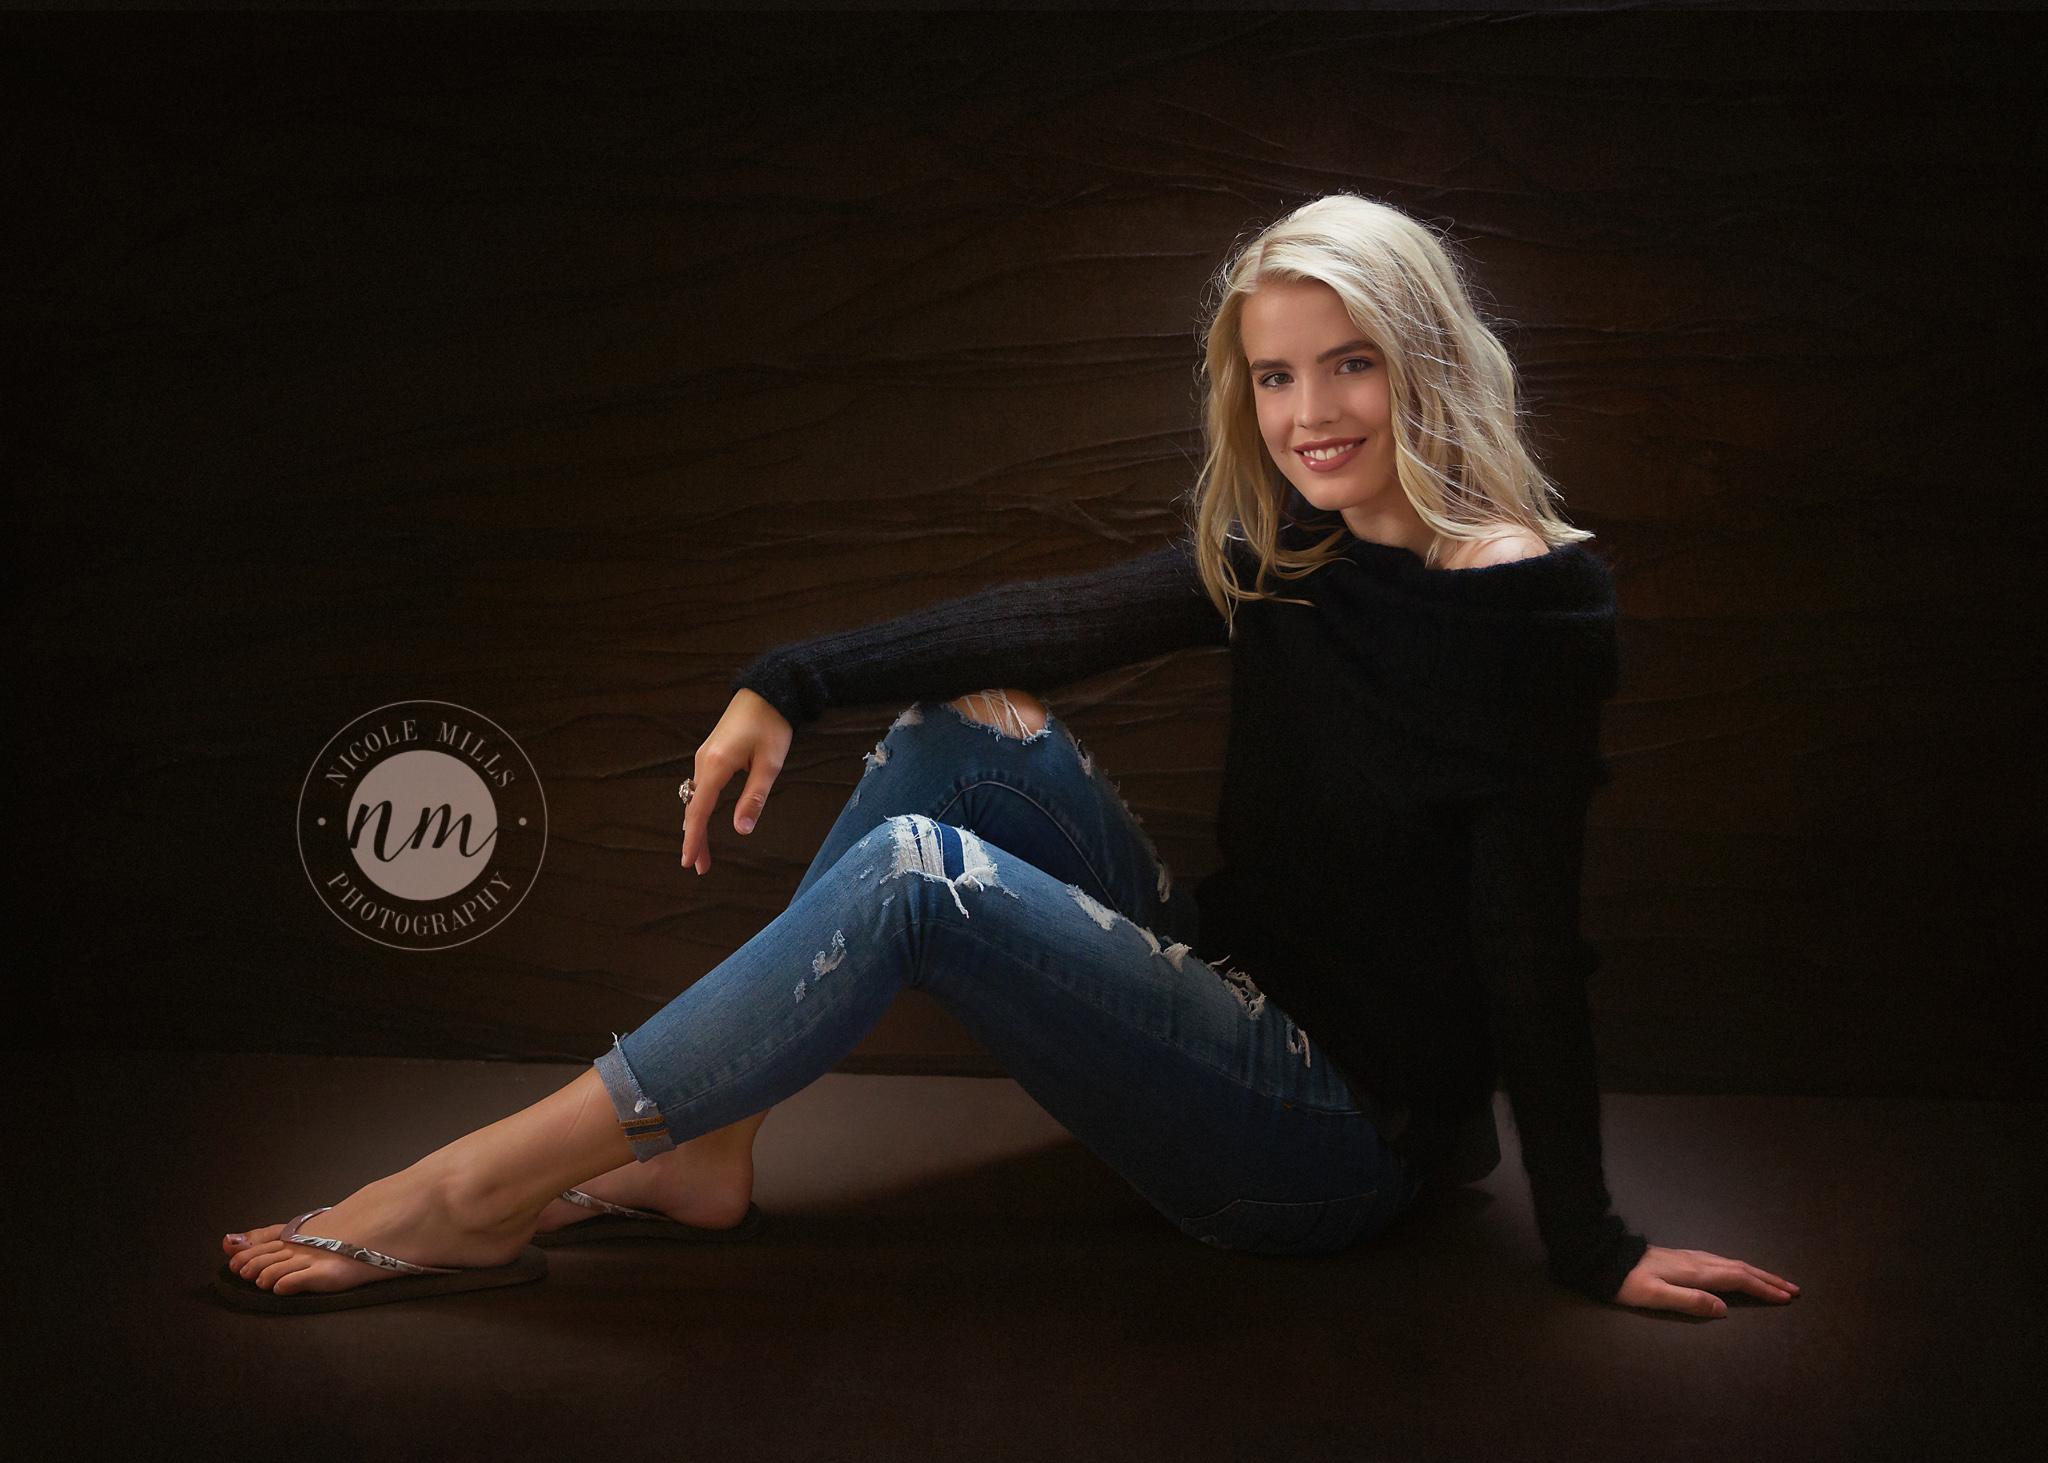 rochester mn senior photographer byron class of 2018